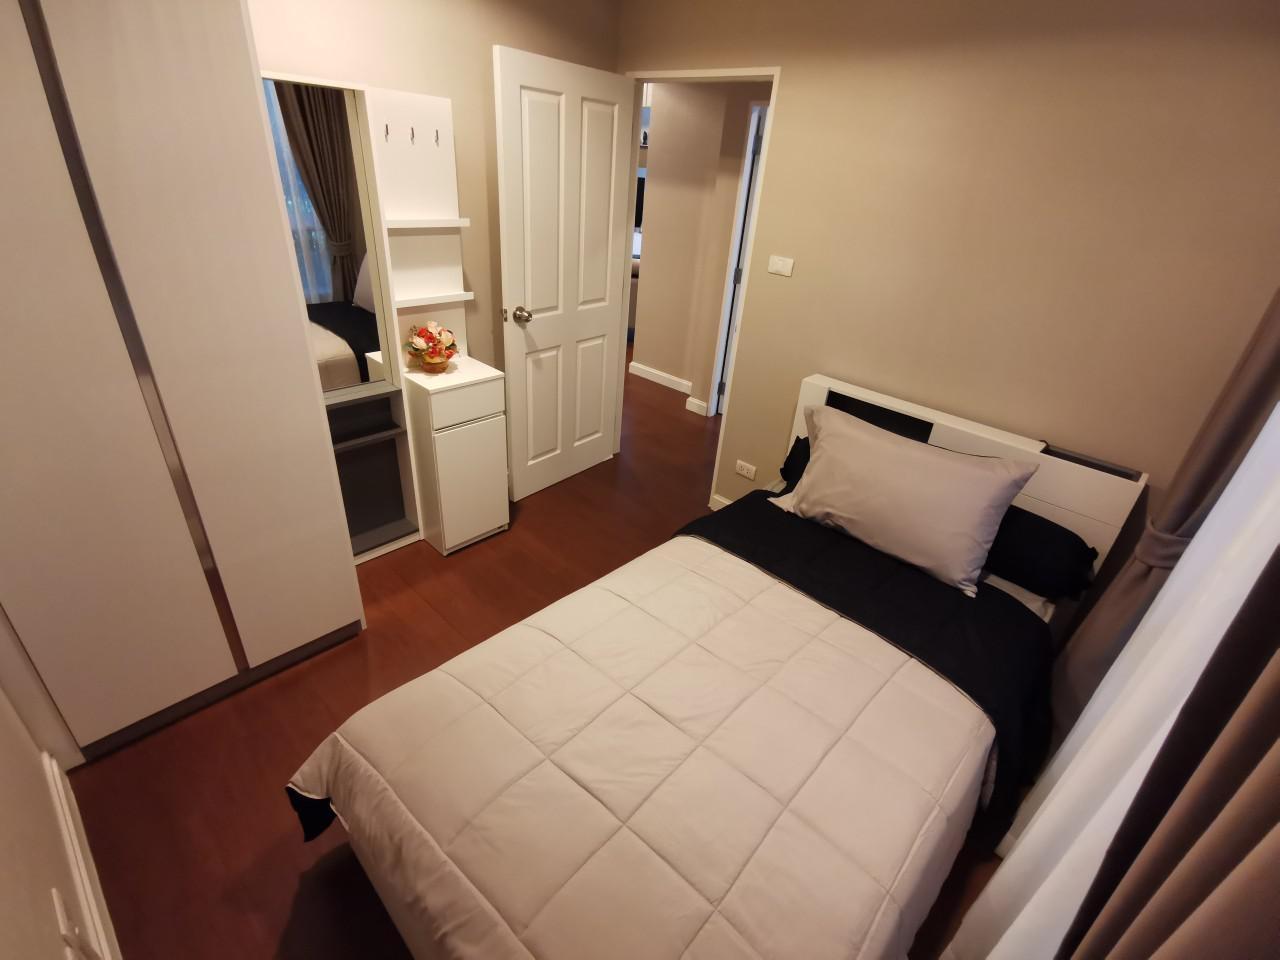 Bangkok Condo Apartment For Rent in Rama 9 Amazing Duplex in Ratchada